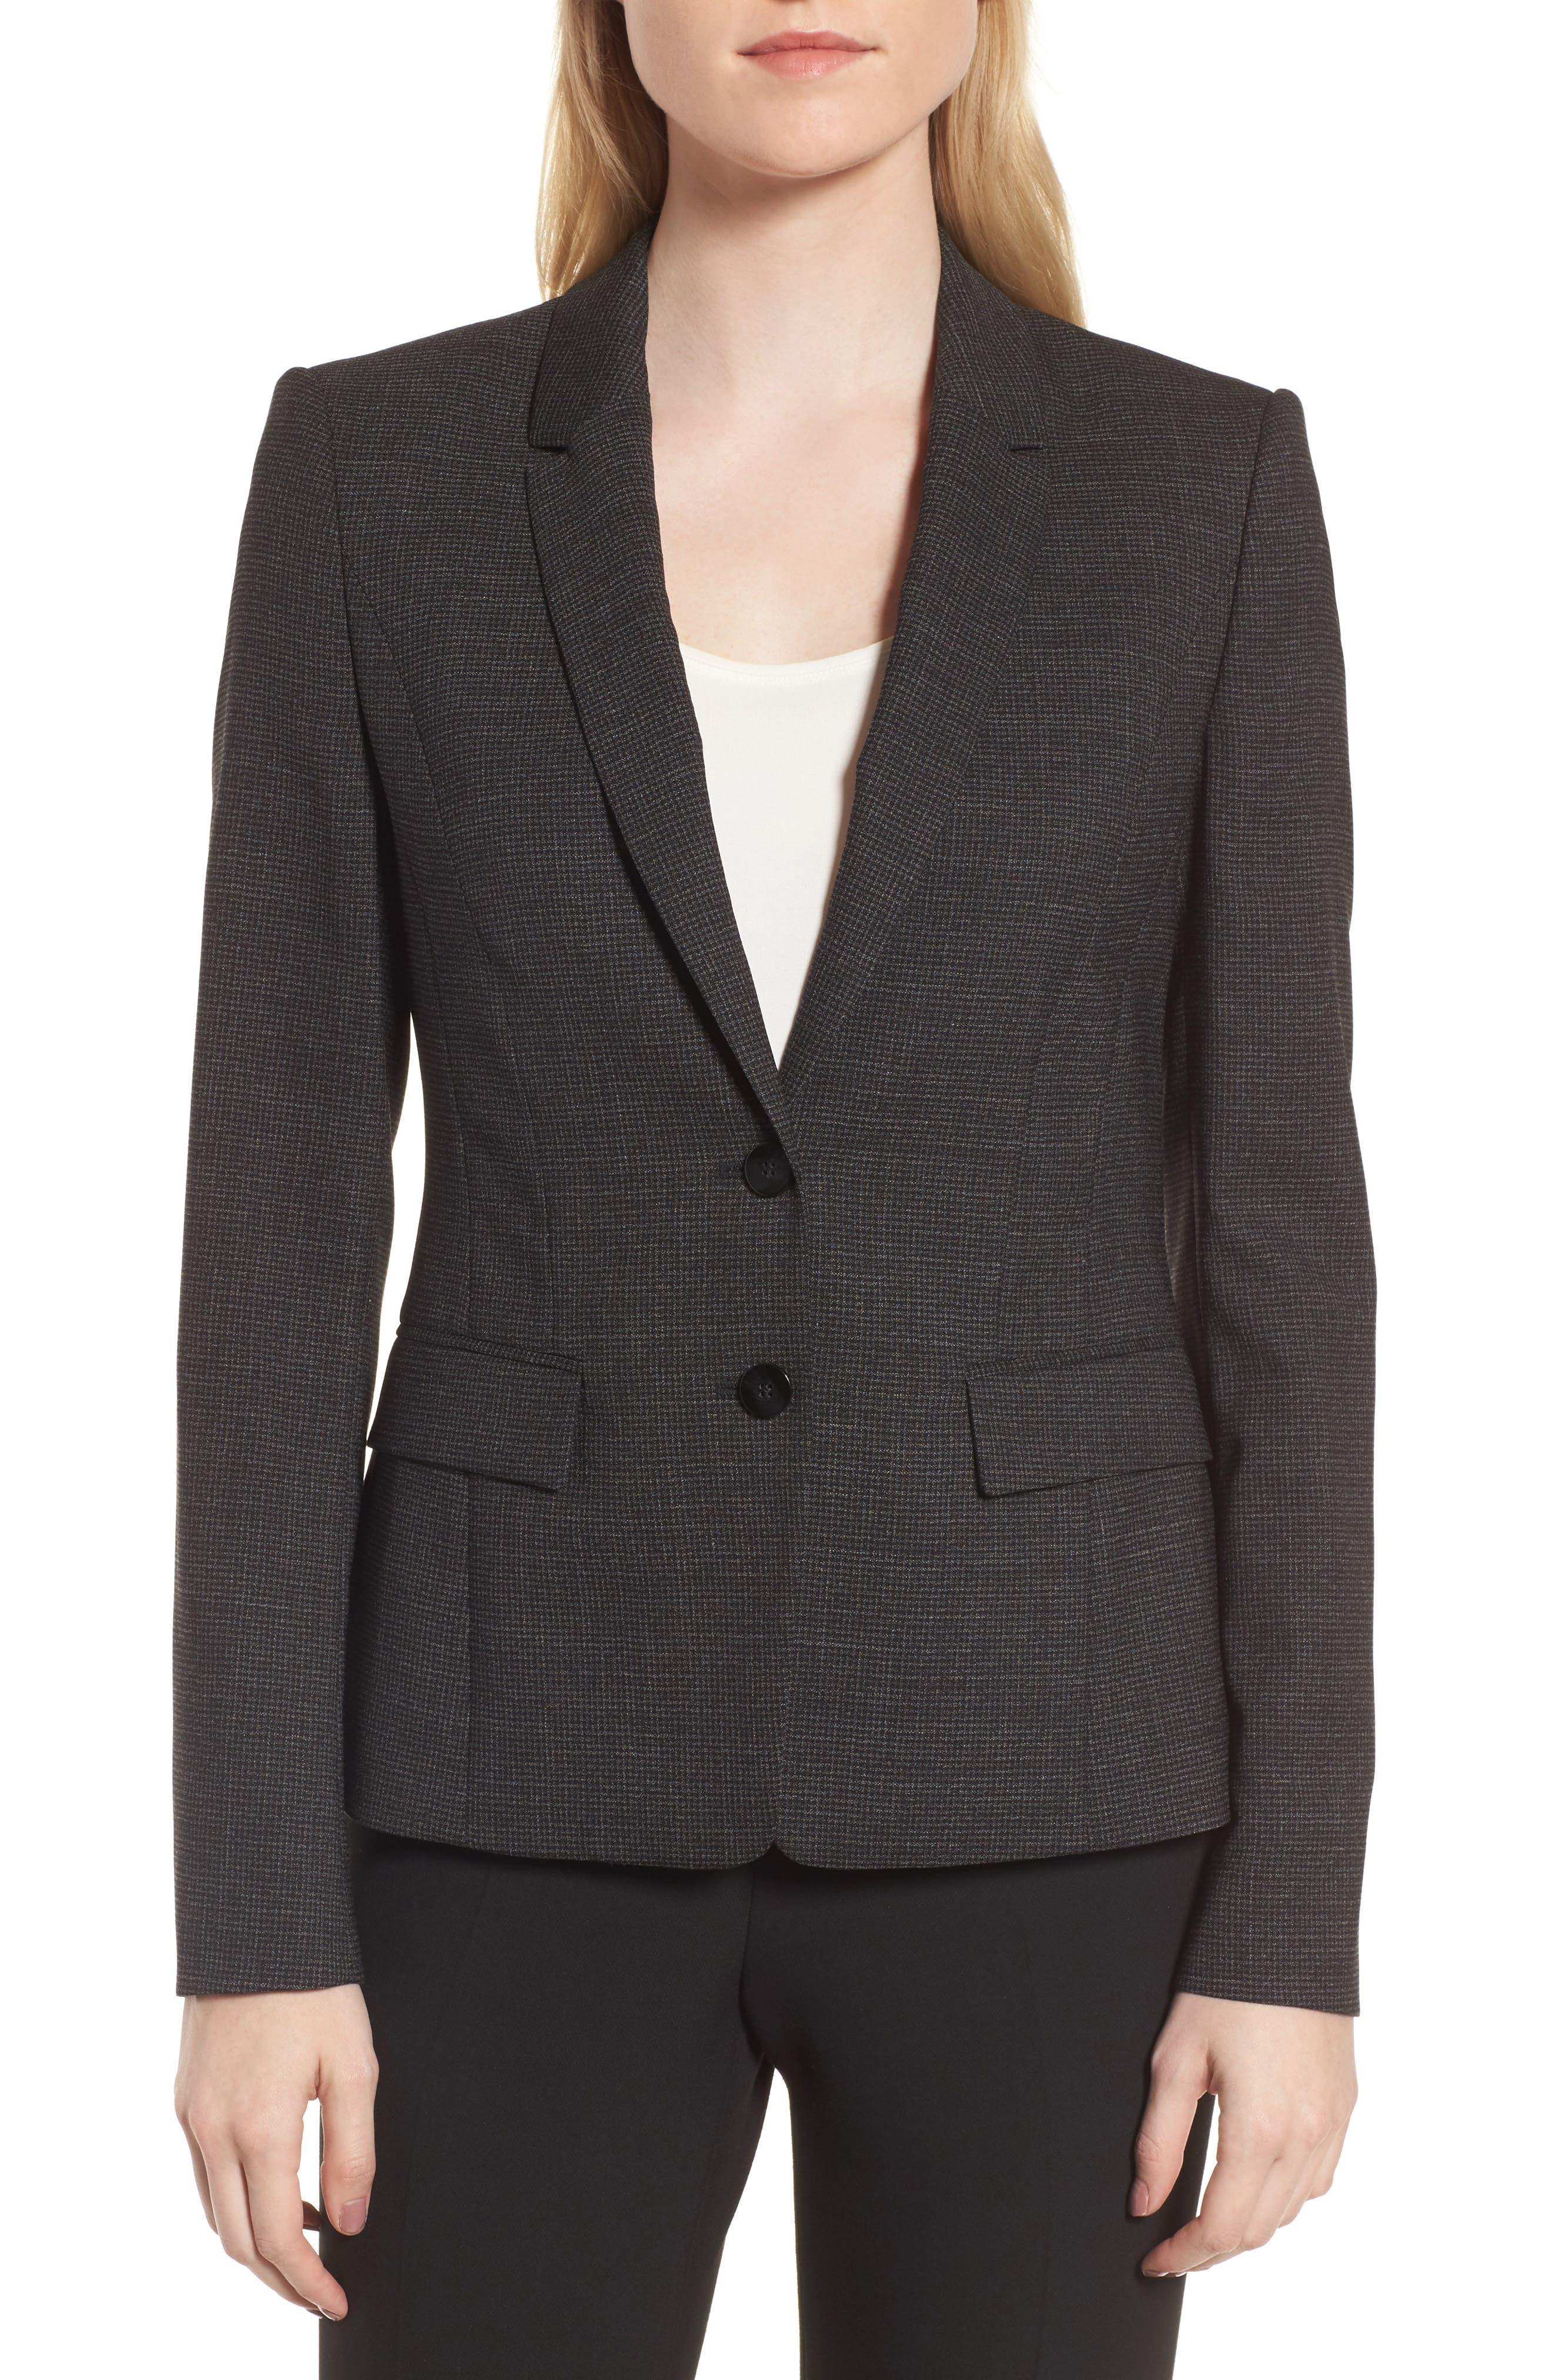 Jewisa Wool Jacket,                         Main,                         color, Black Fantasy